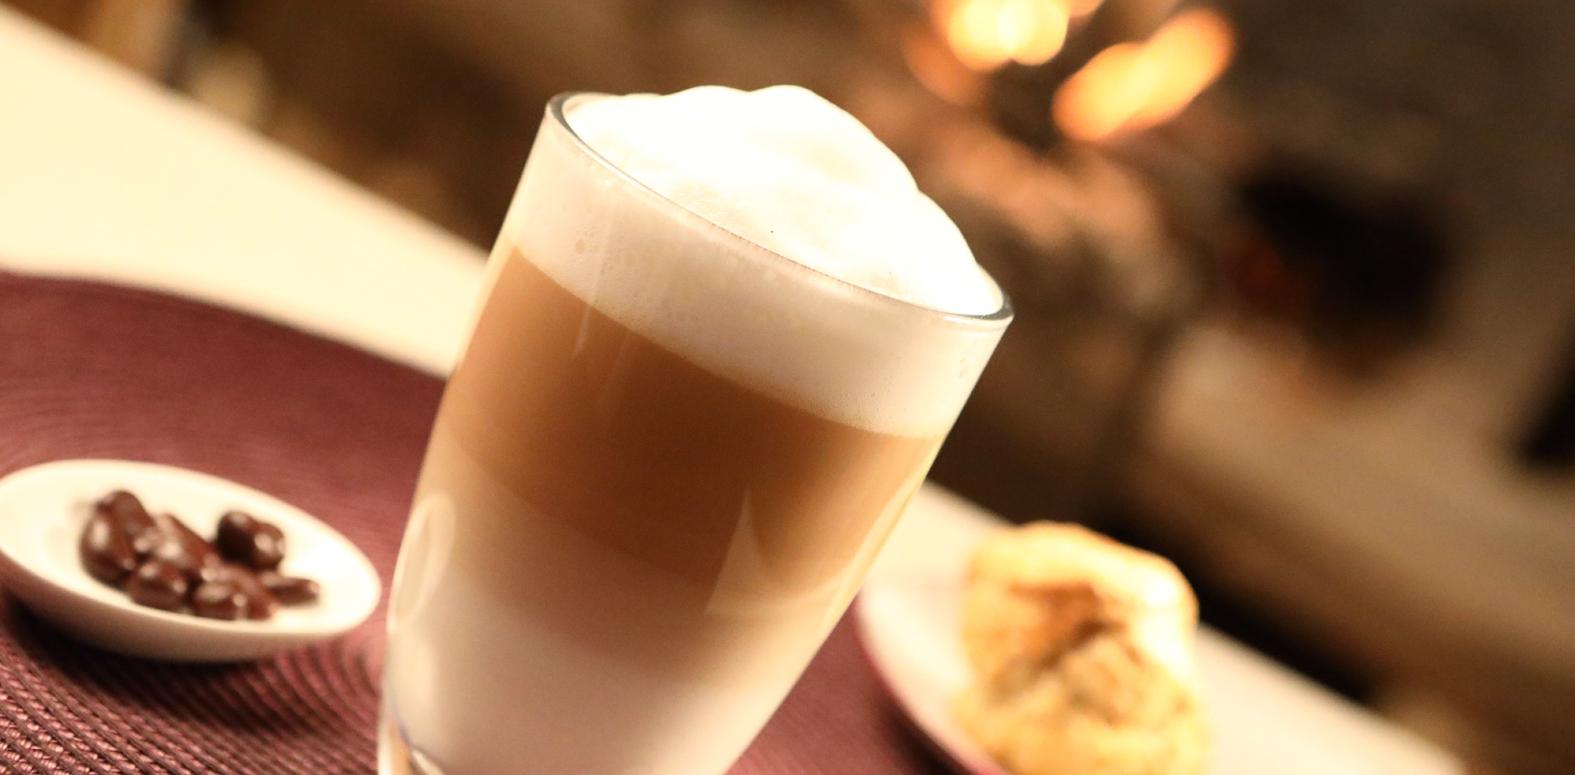 boissons - café latte macchiato